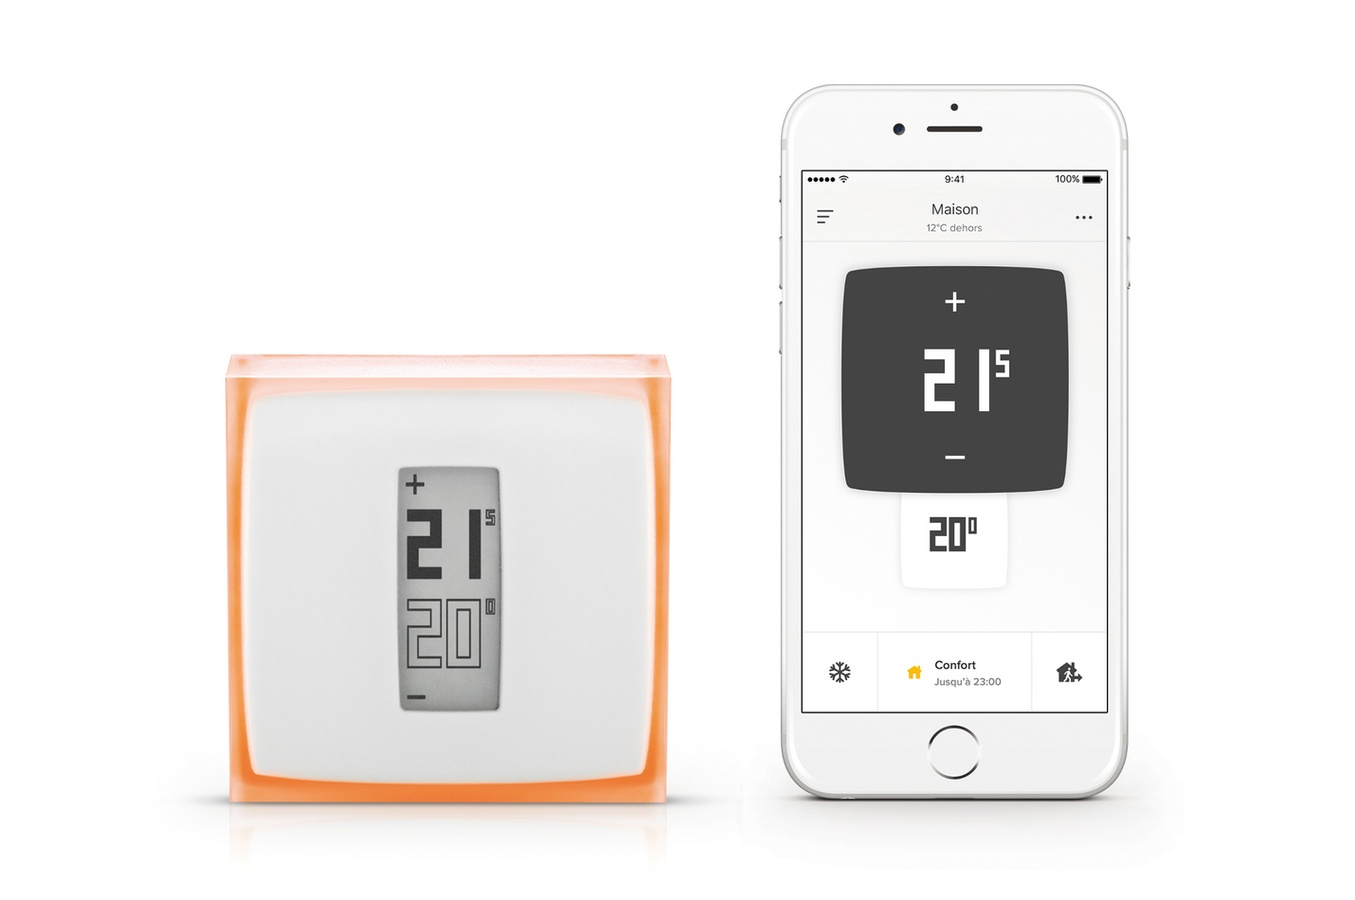 bon plan le thermostat connect netatmo google home mini 139 euros au lieu de 228 euros. Black Bedroom Furniture Sets. Home Design Ideas